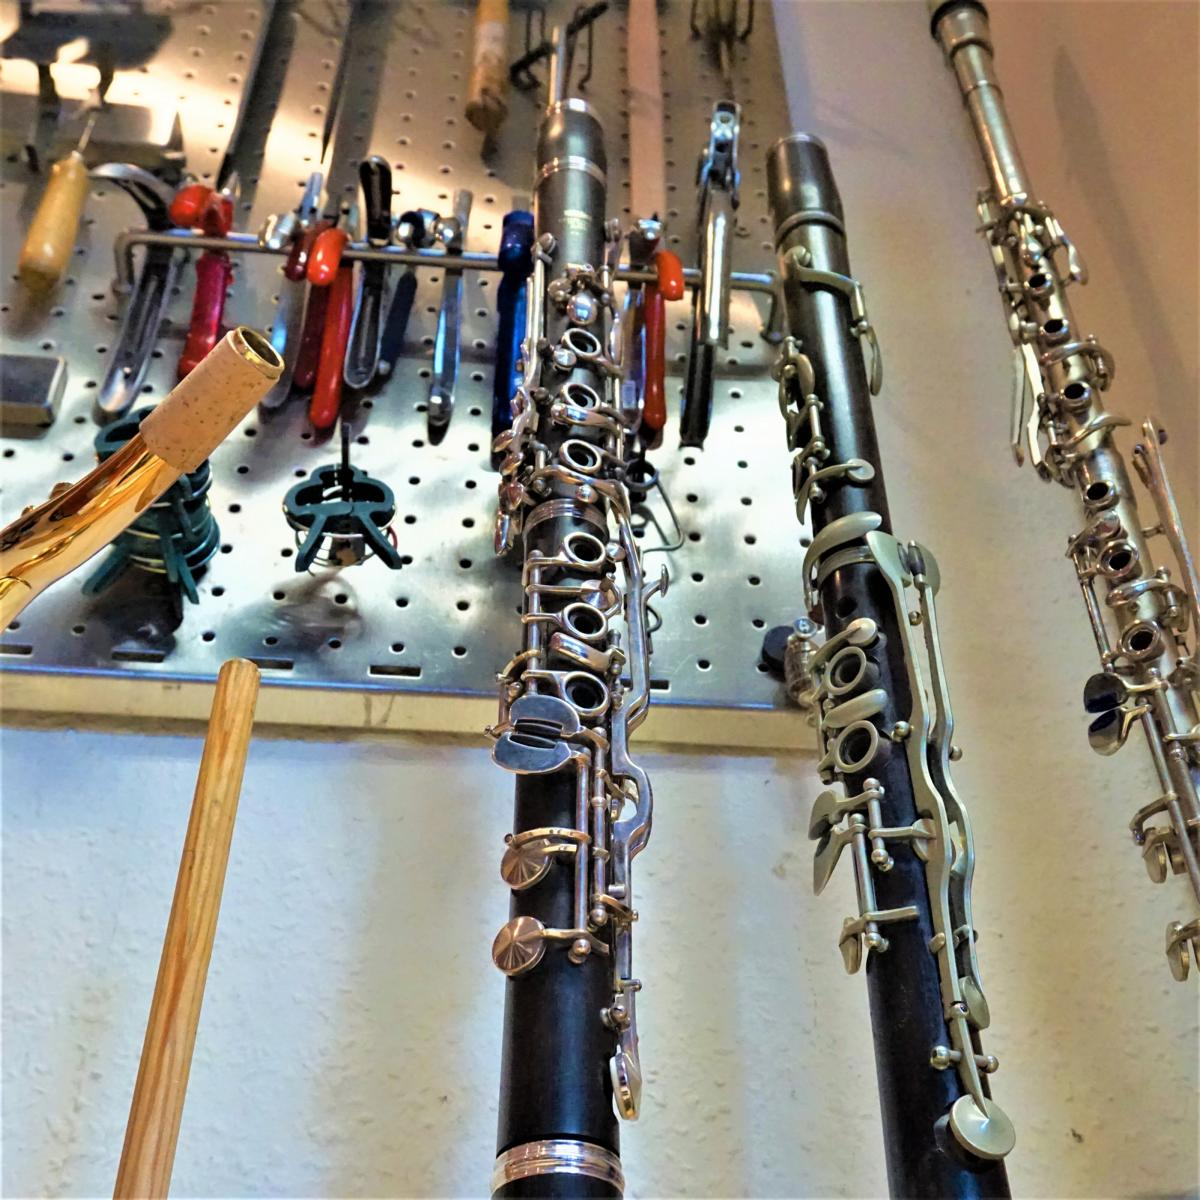 Style Hannover musimiet 4 - Musimiet: Probier' doch mal ein Instrument!